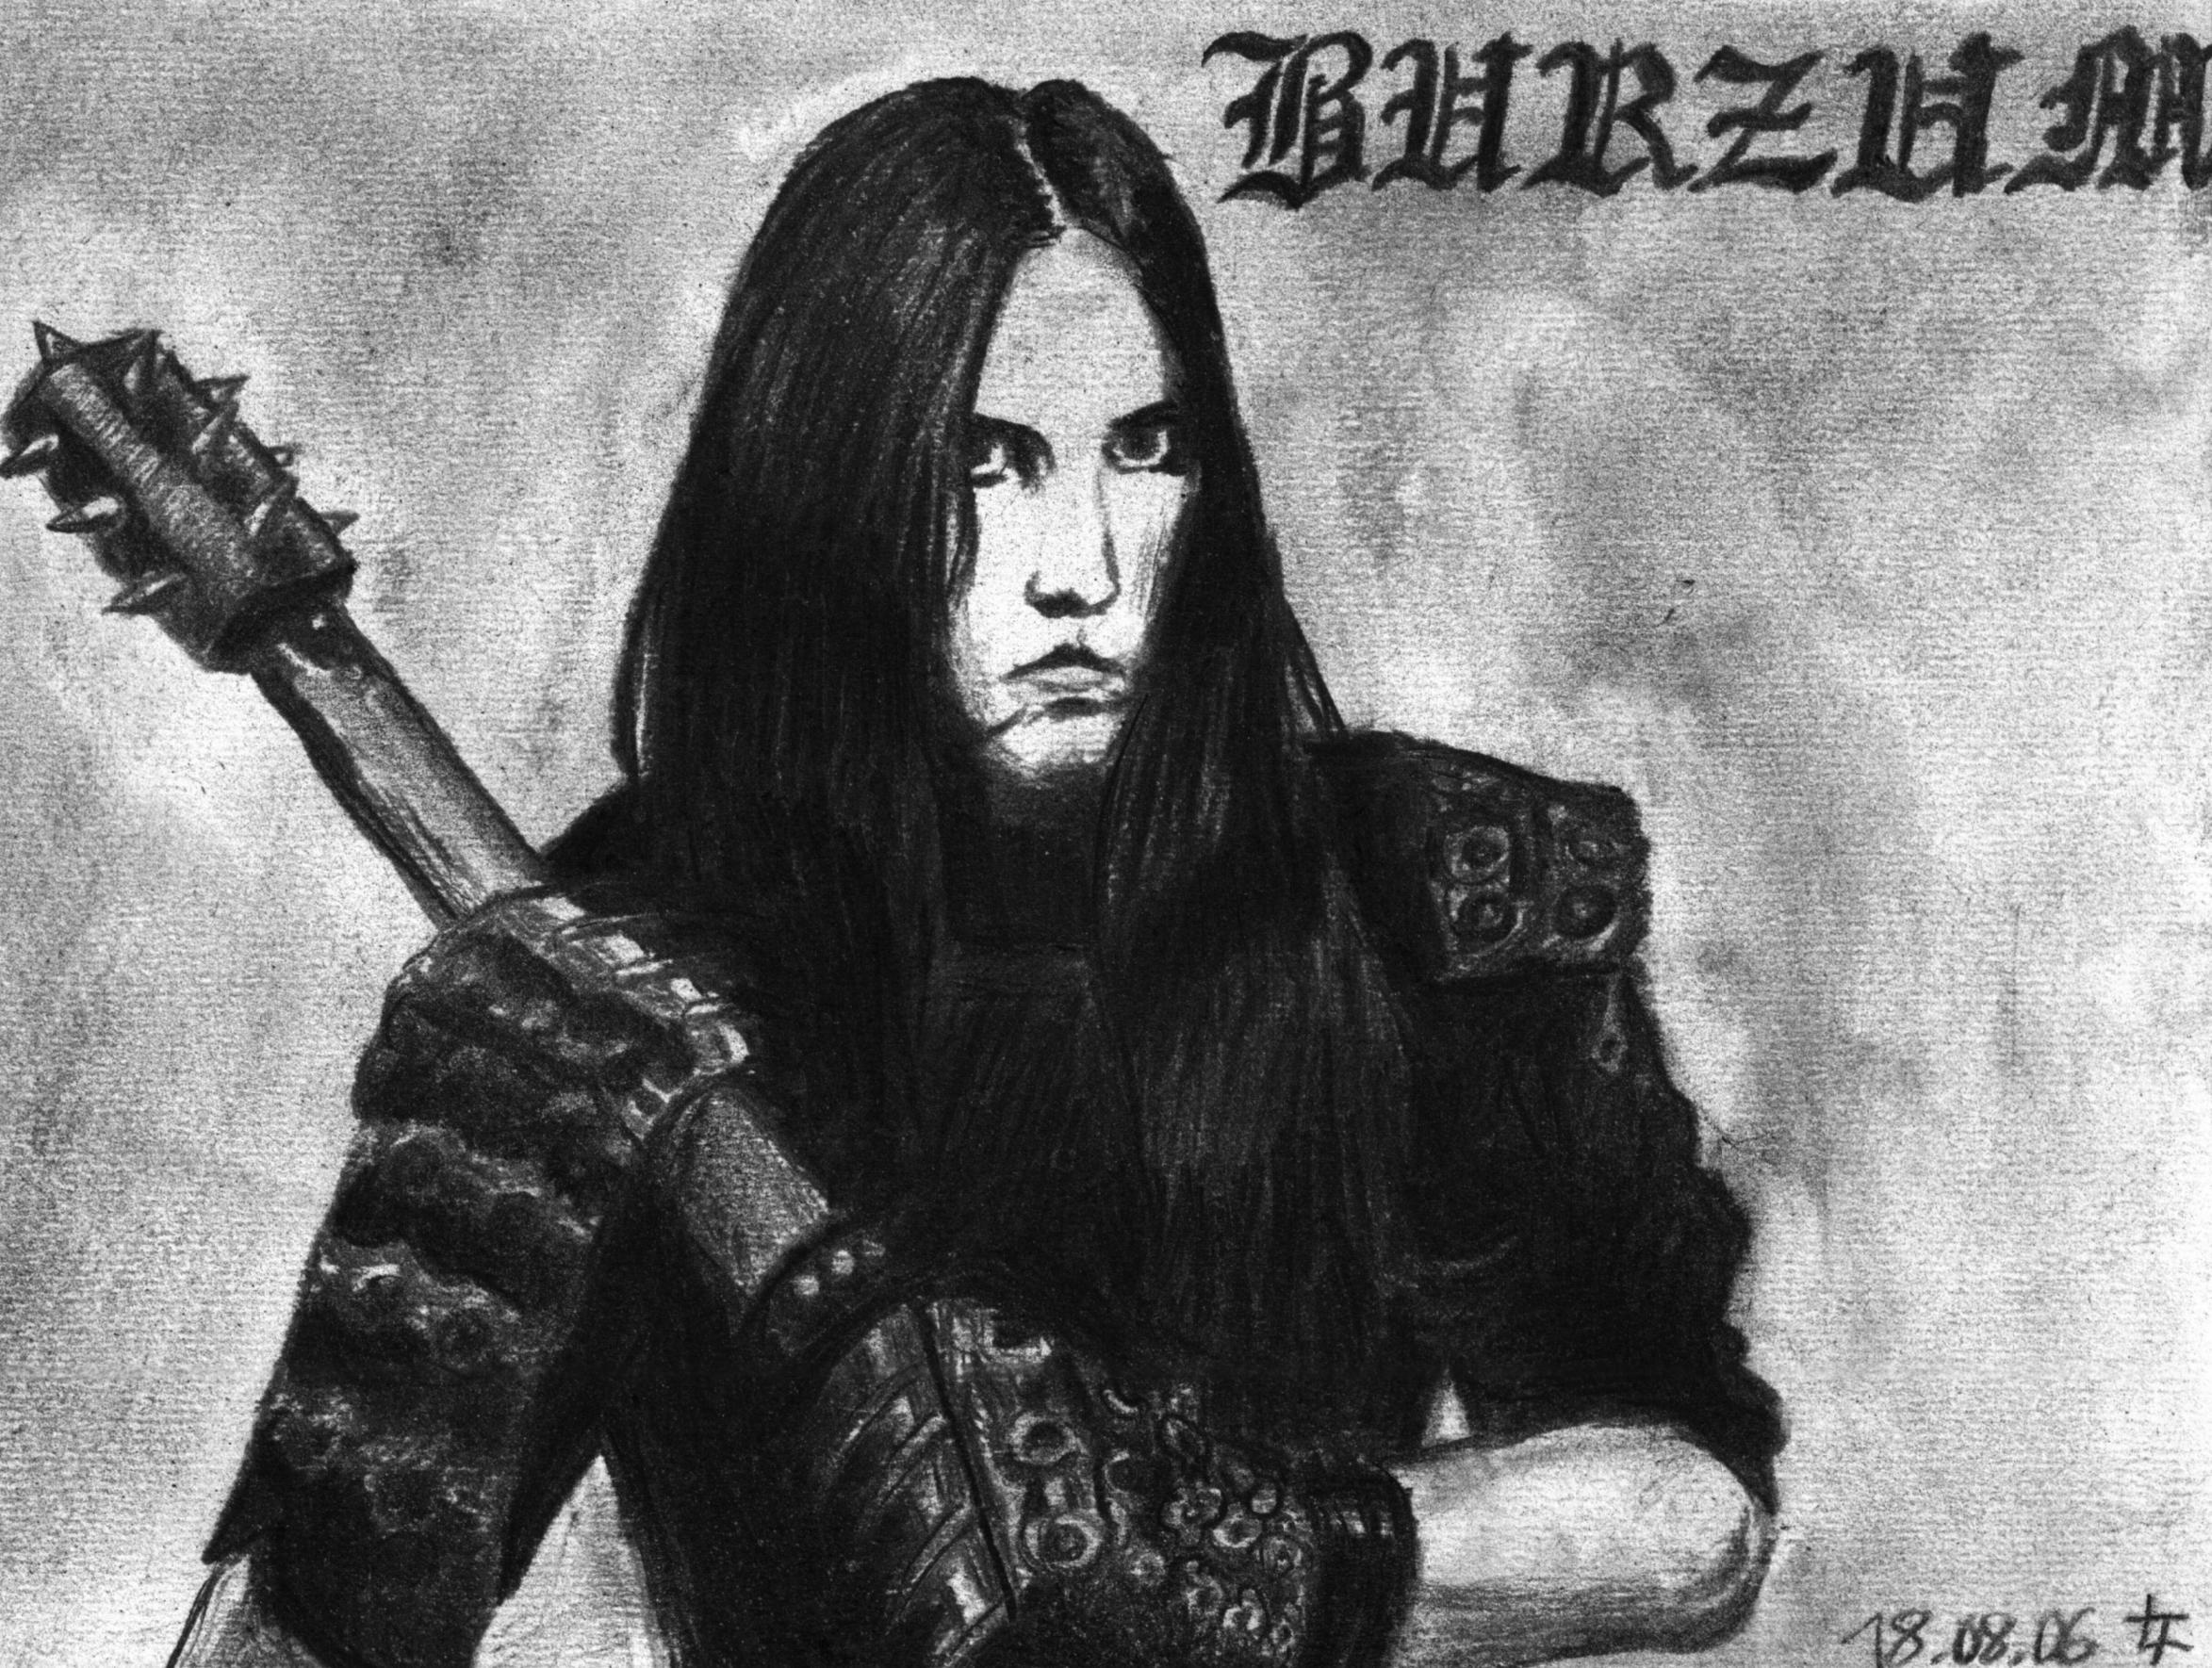 Daughter varg vikernes Varg Vikernes'